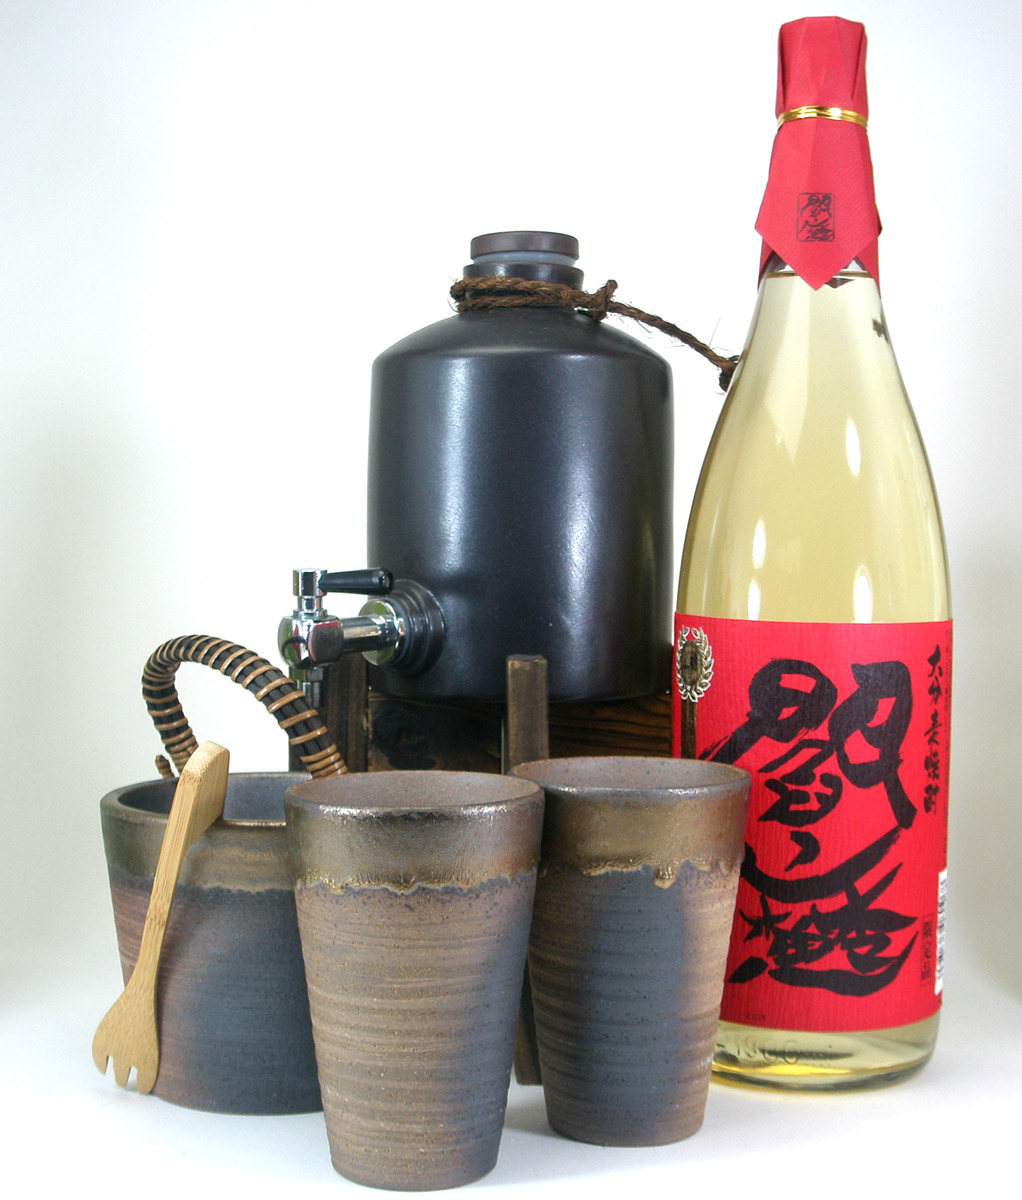 焼酎サーバーセット全セット版(老松酒造 三年長期熟成麦焼酎 閻魔 1800ml)